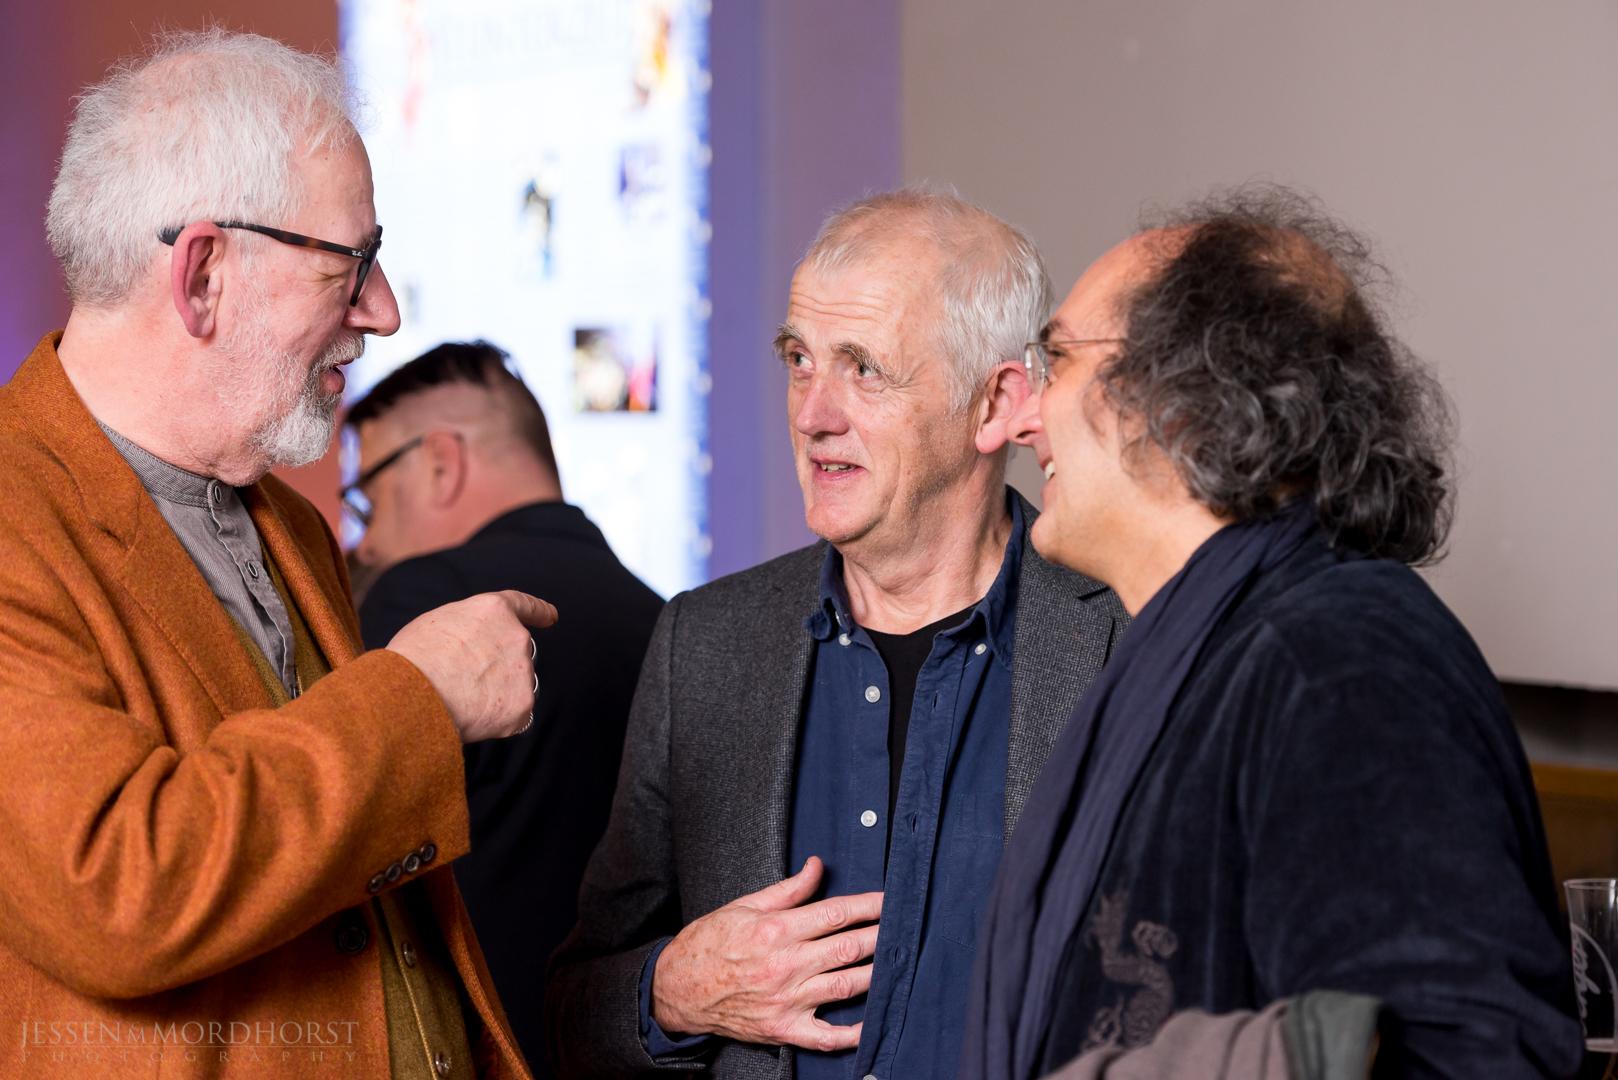 Uwe Golz, Stephen Warbeck (Ehrenpreis Interantional 2016), Bernd Ruf